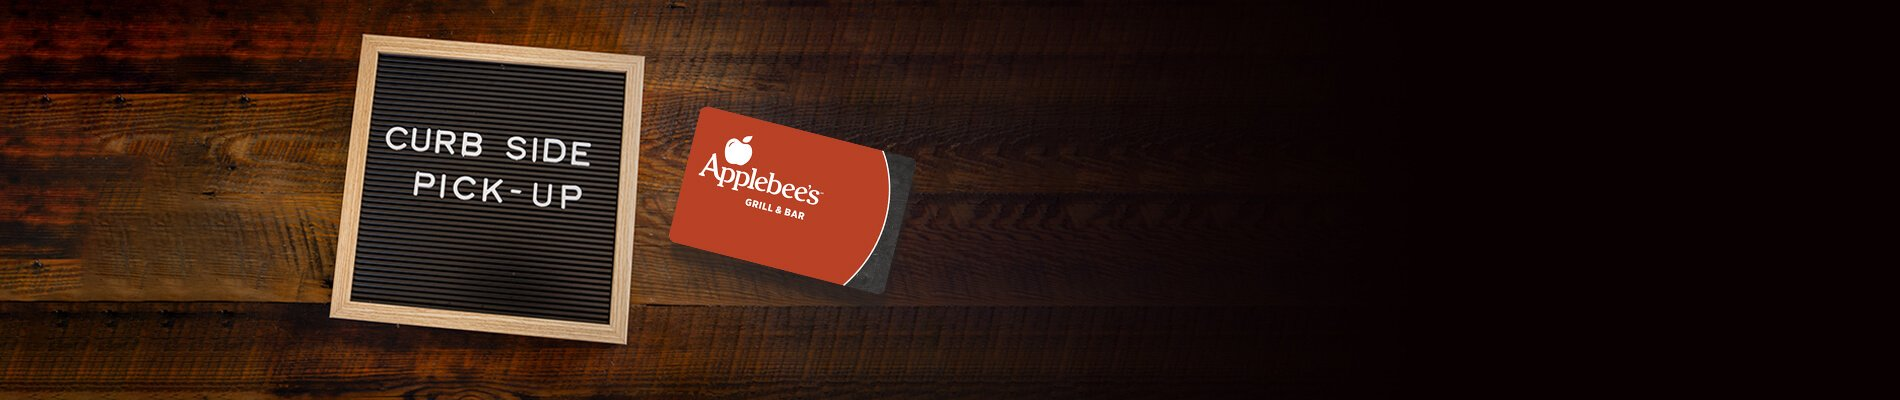 Applebee's eGift Card Sale